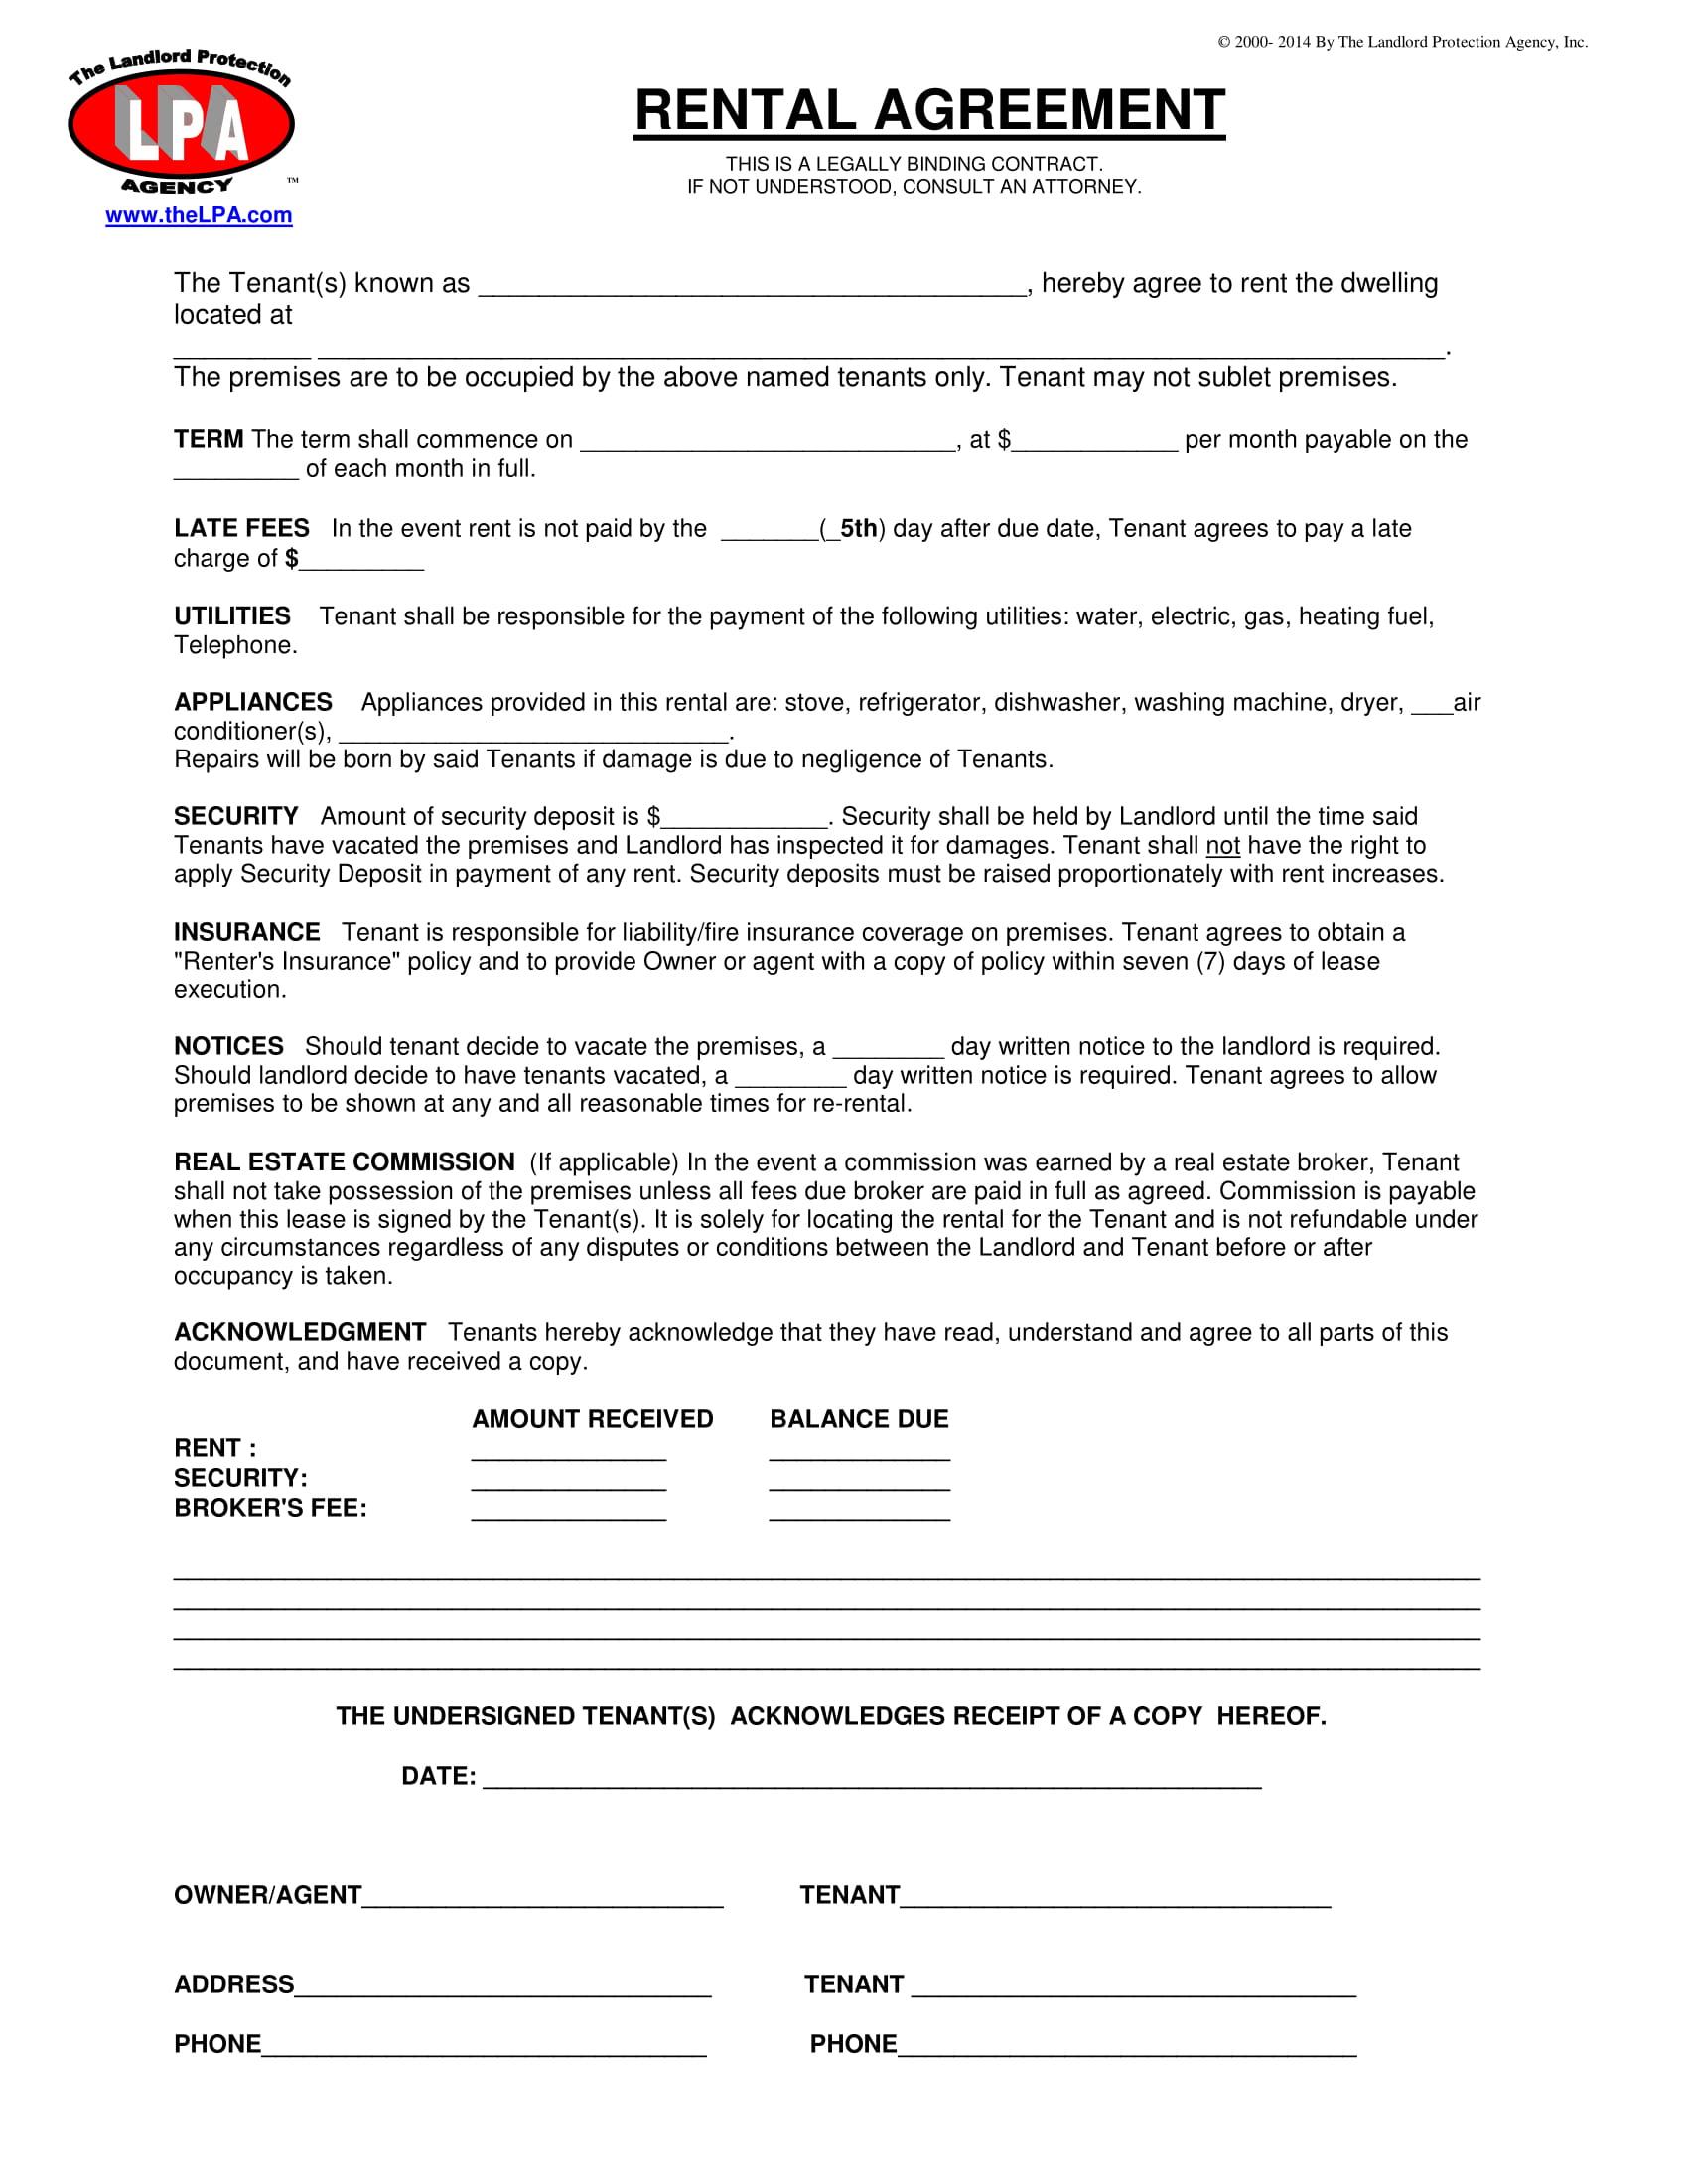 free rental agreement 1